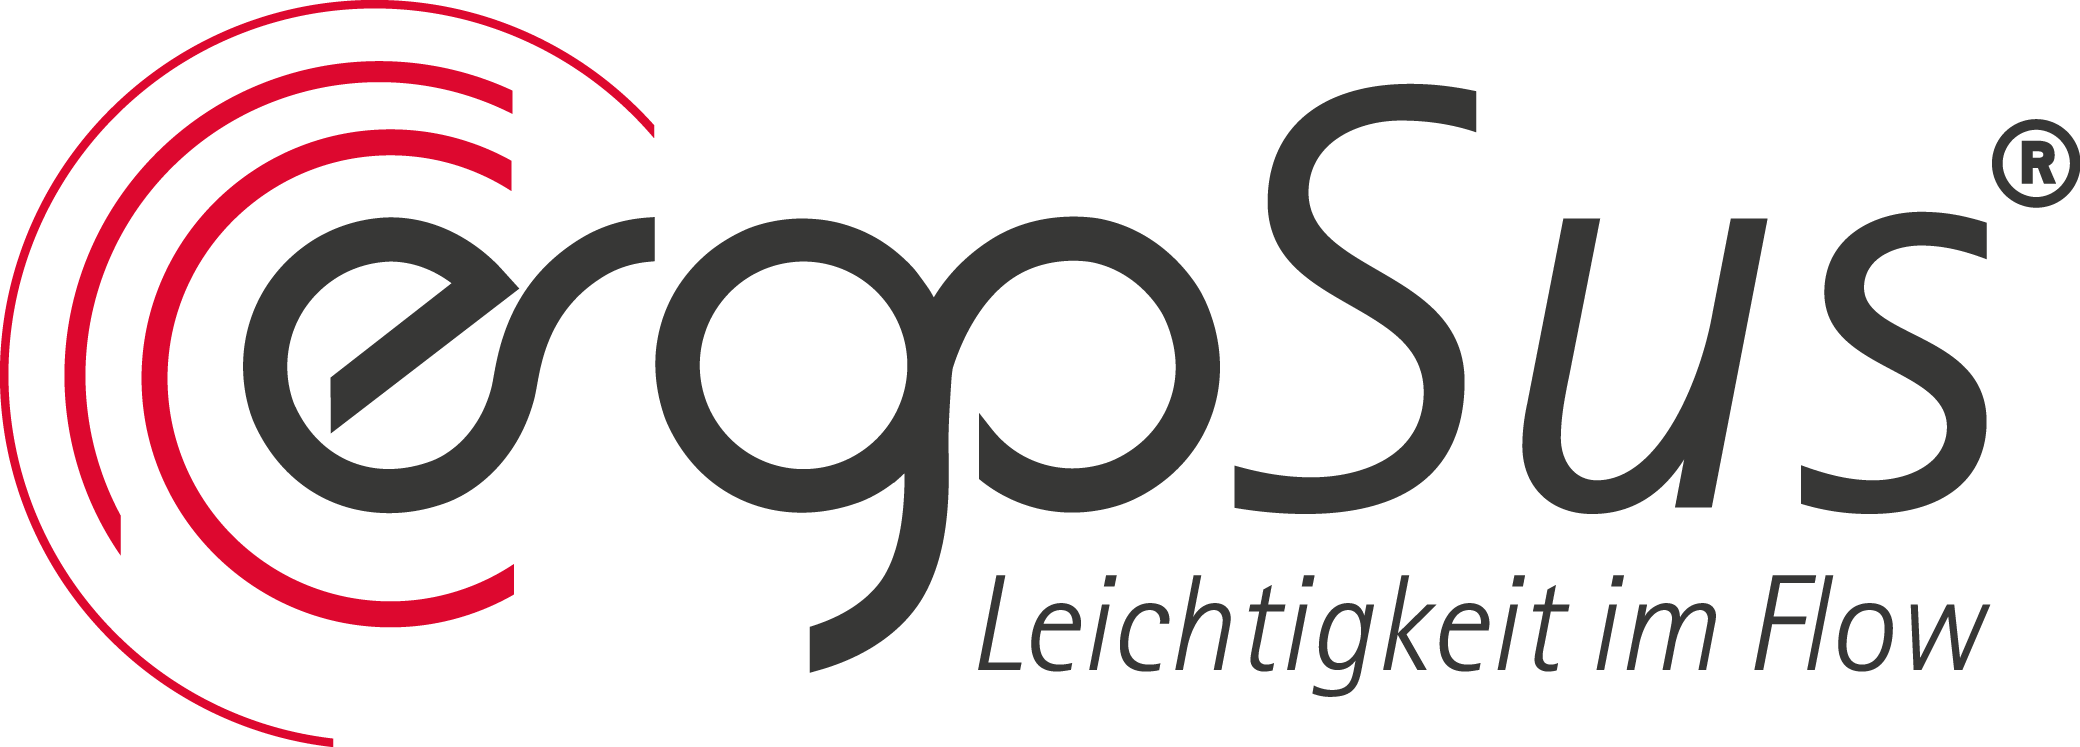 ErgoSus GmbH Logo